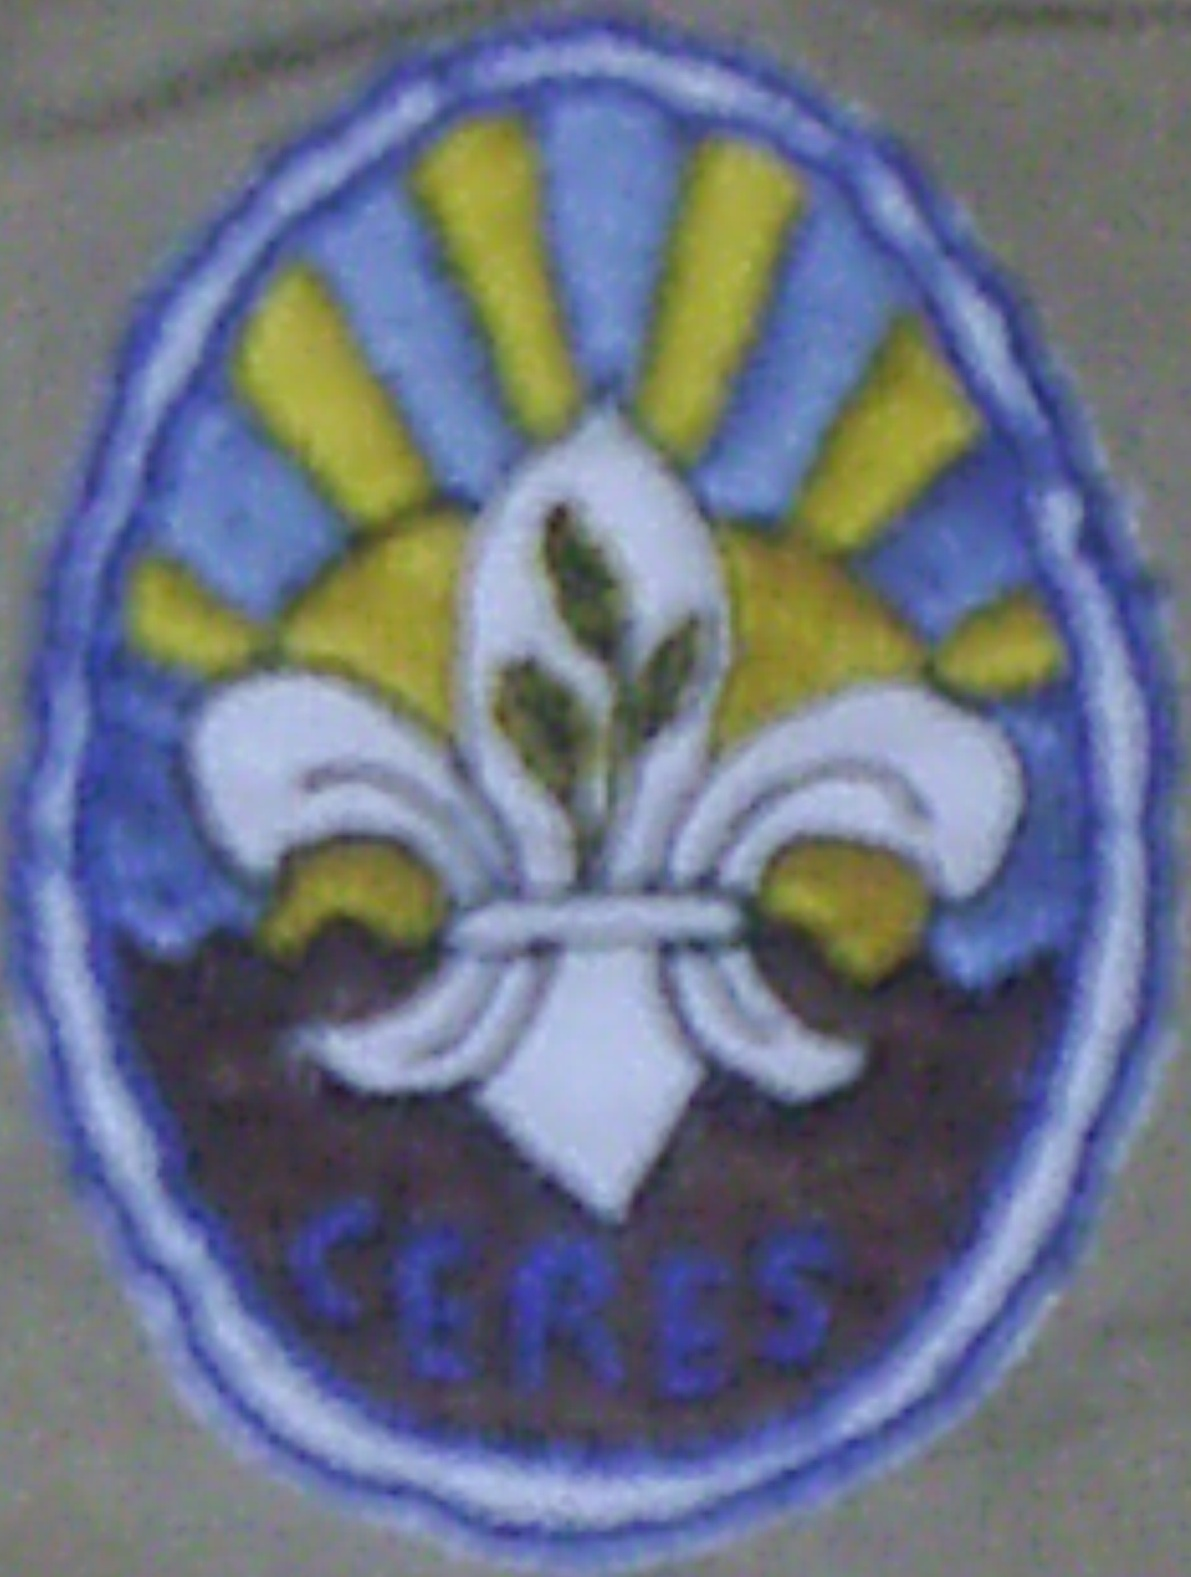 grupo scout ceres - sagrajas badajoz.JPG